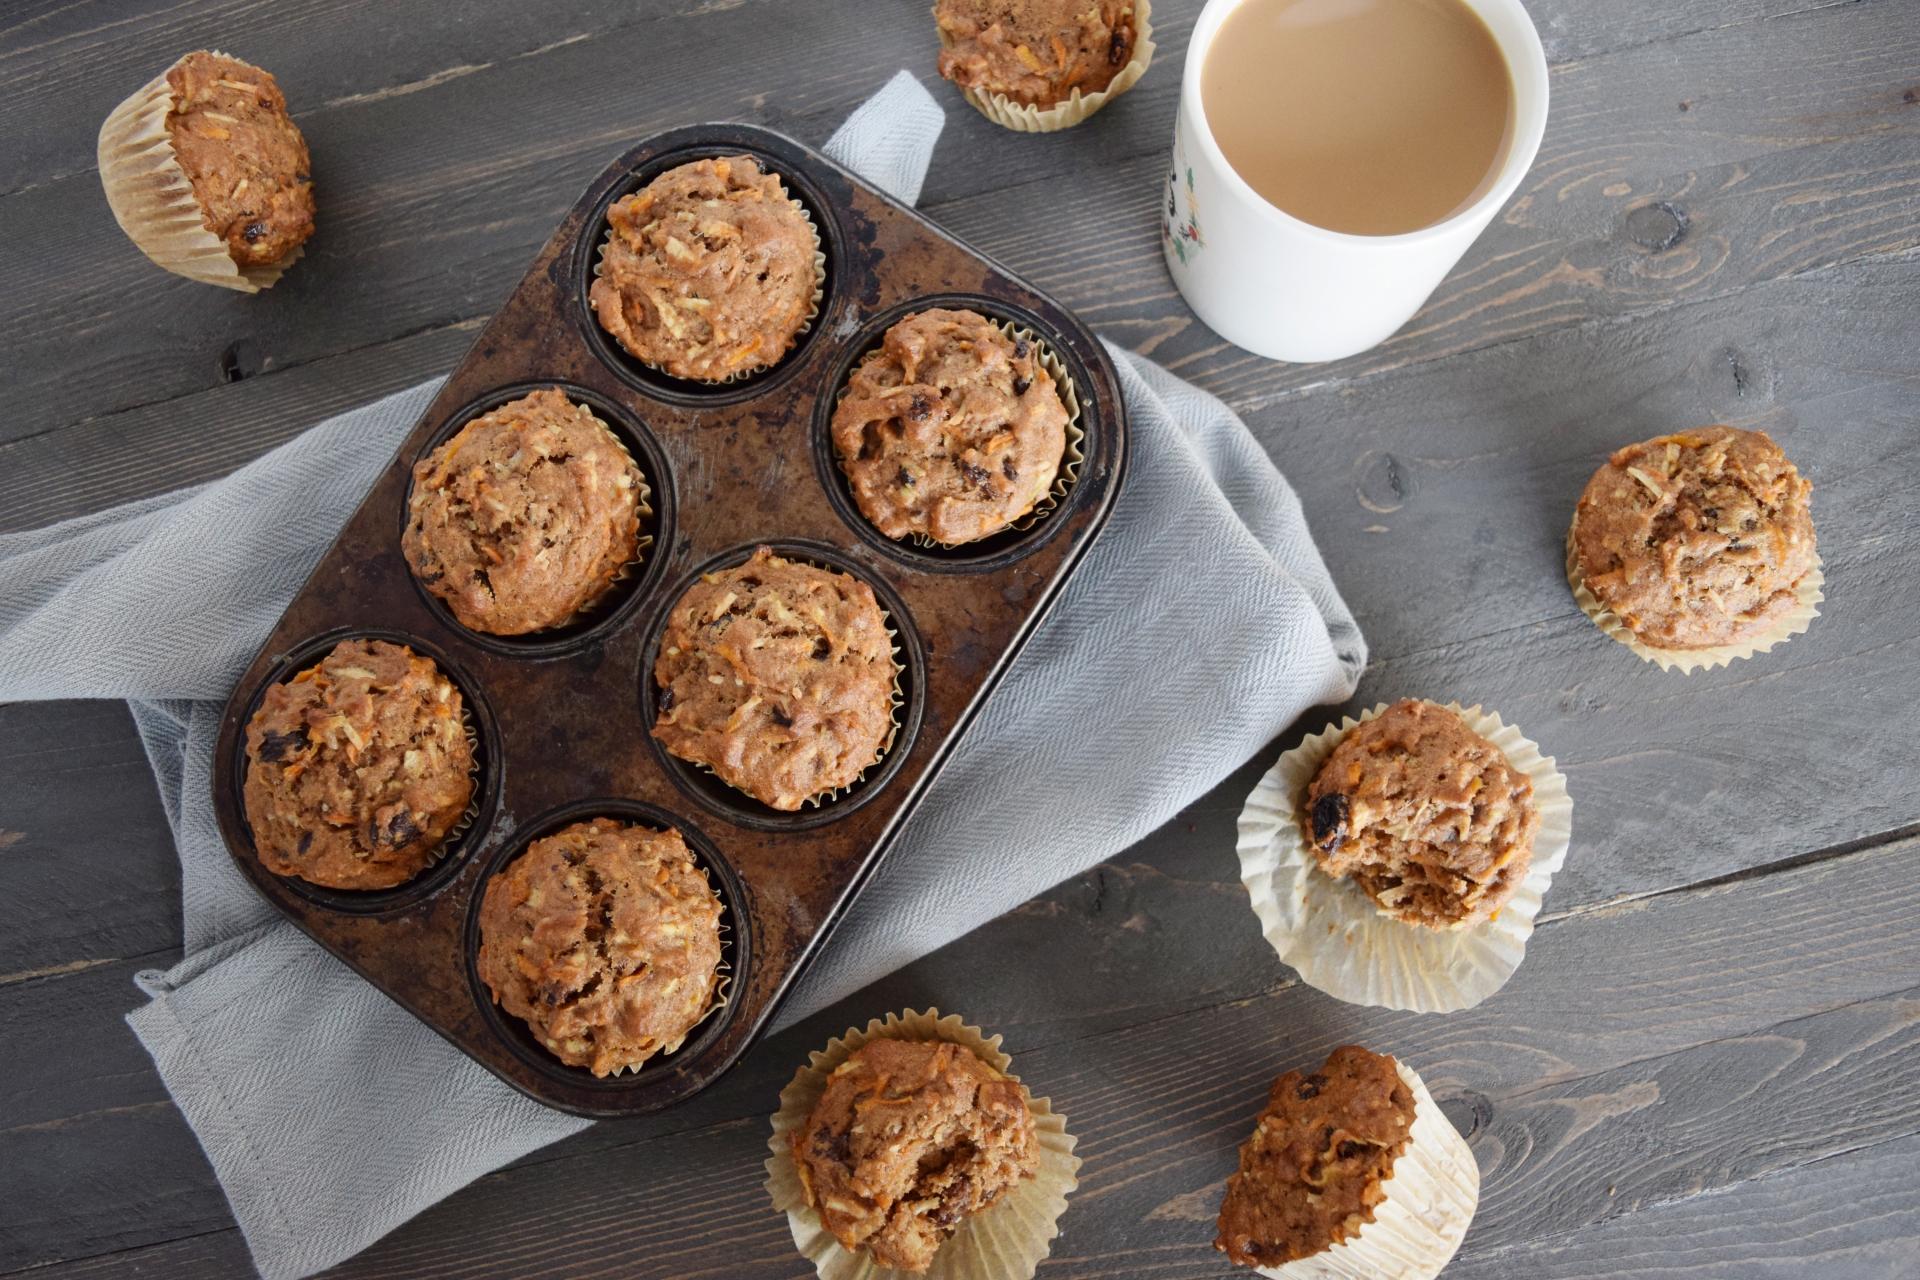 milanaise_recette_muffins_dejeuner